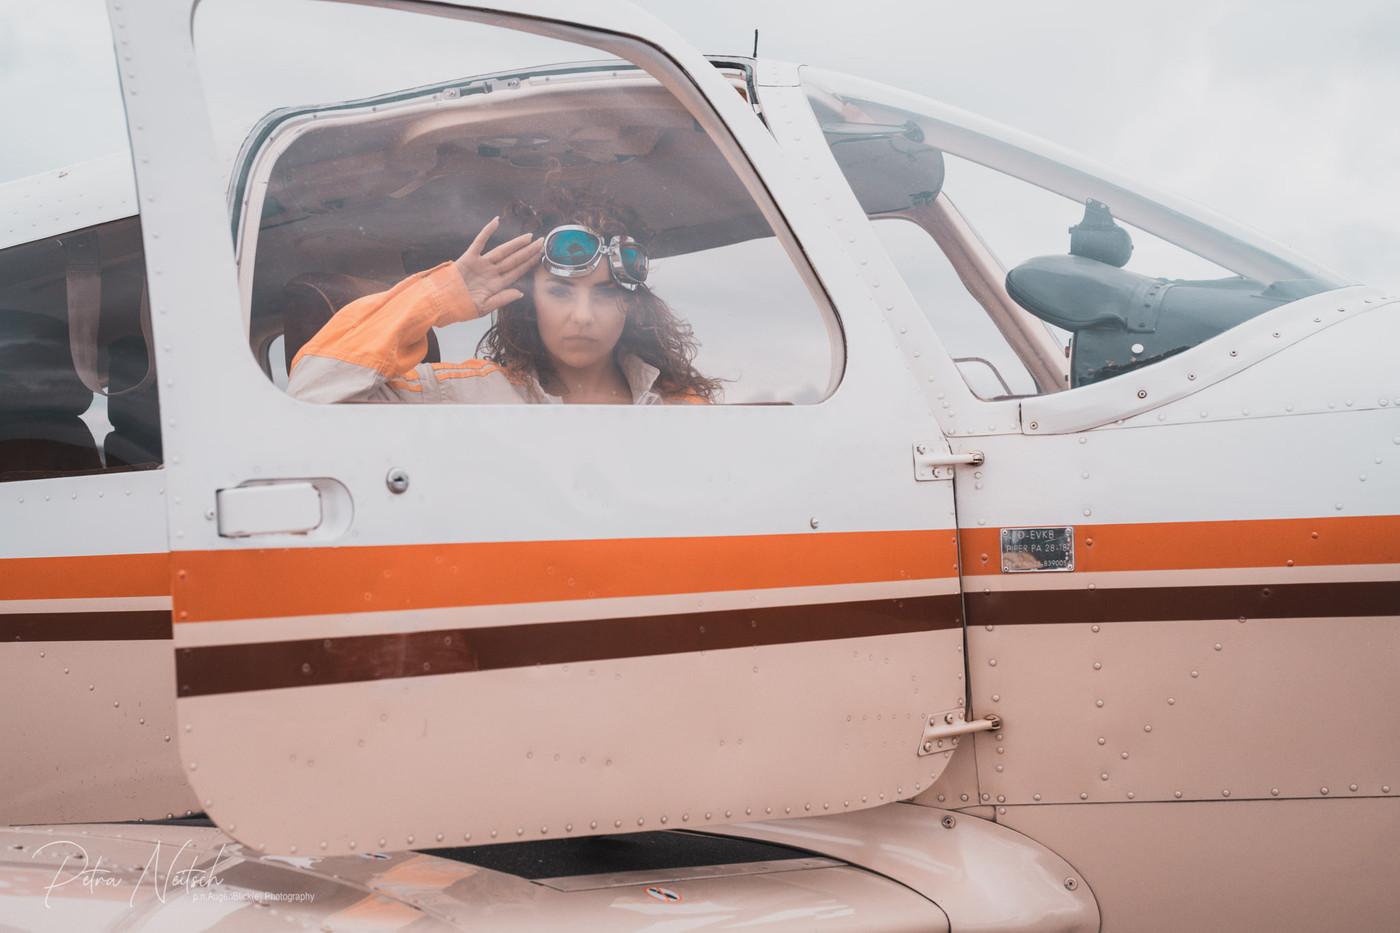 09-2019-Planes Girls and Rockn Roll-68.j